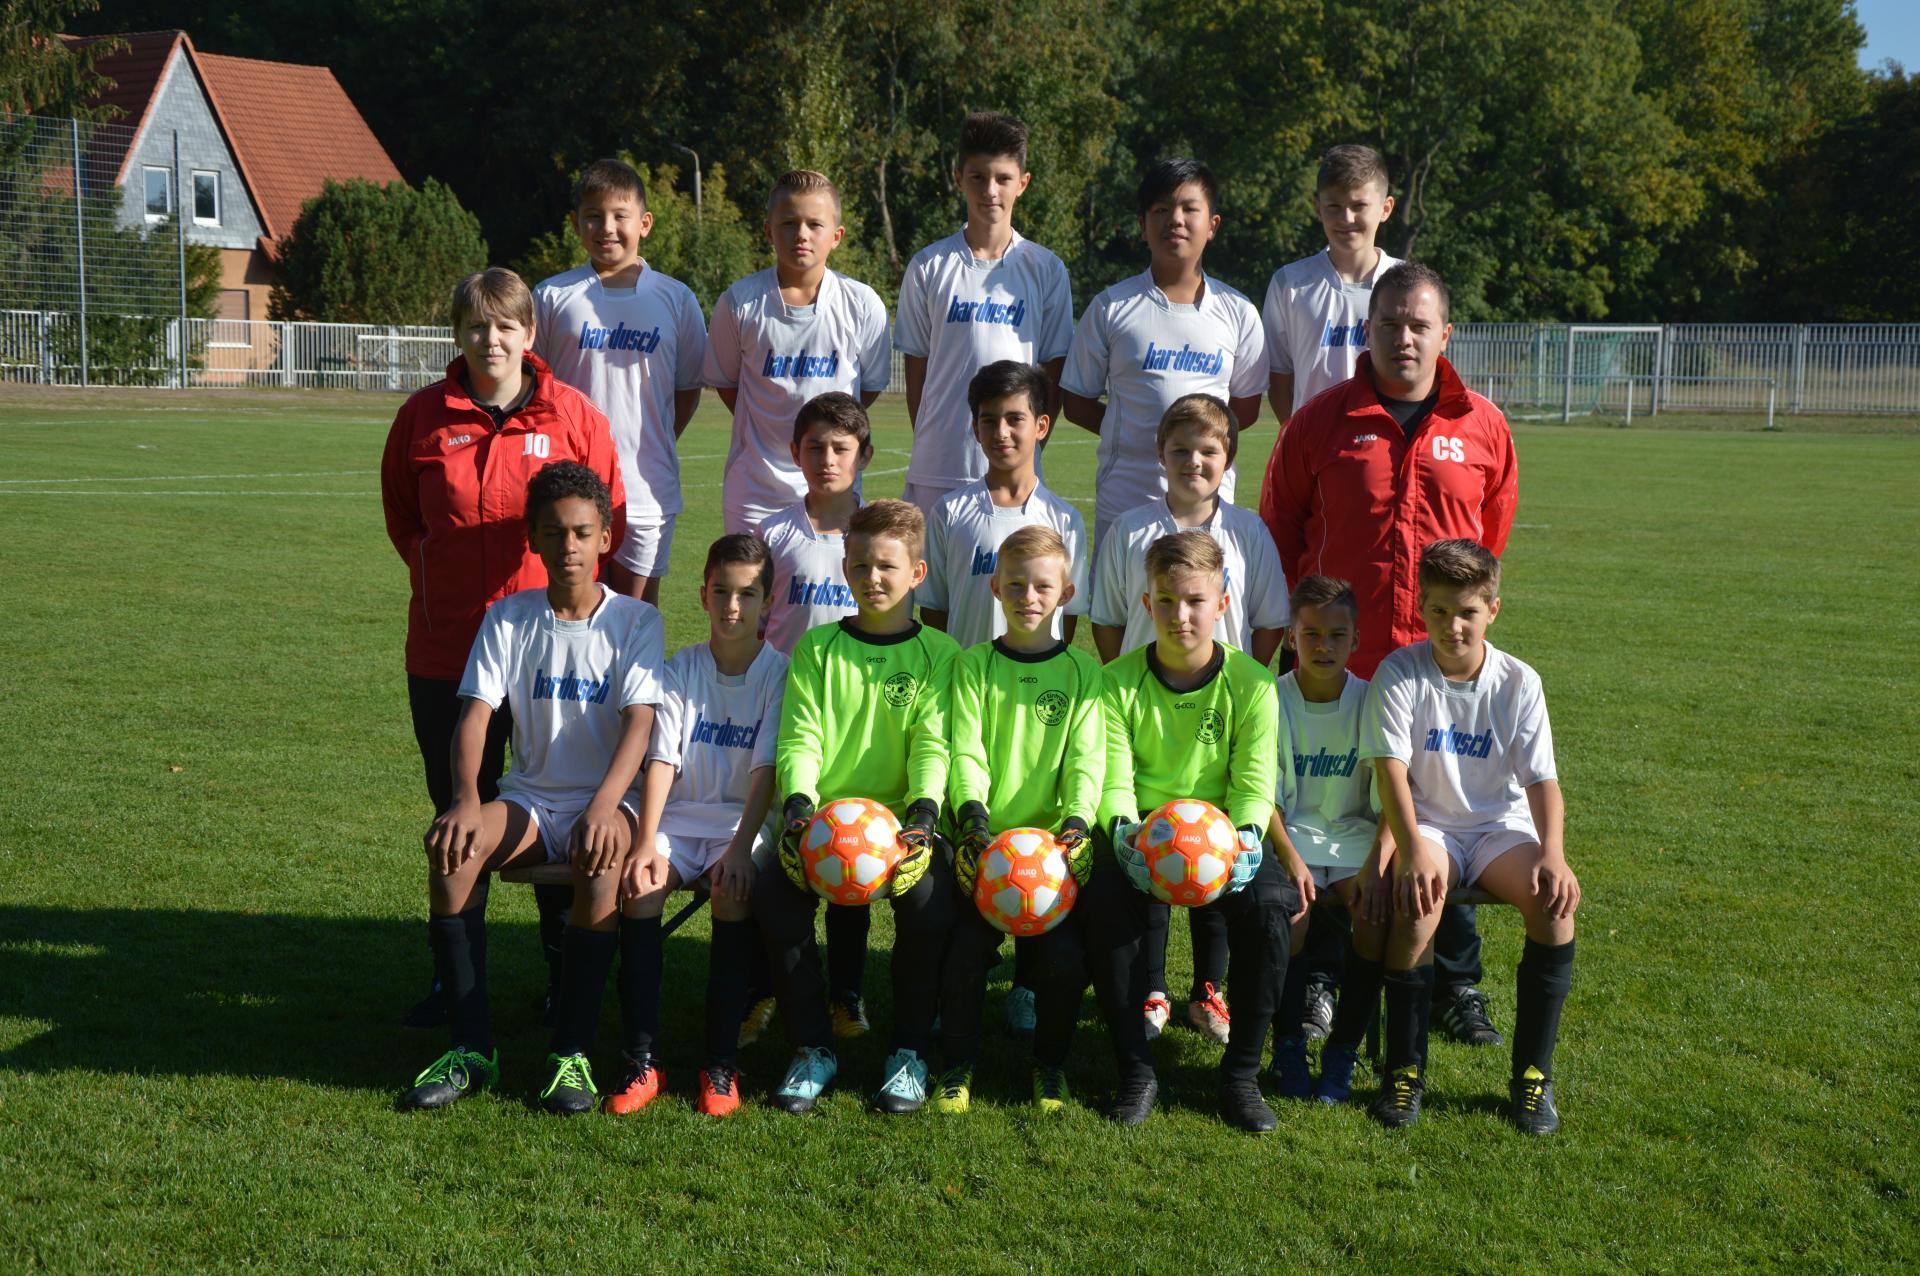 D2-Junioren 2018/19